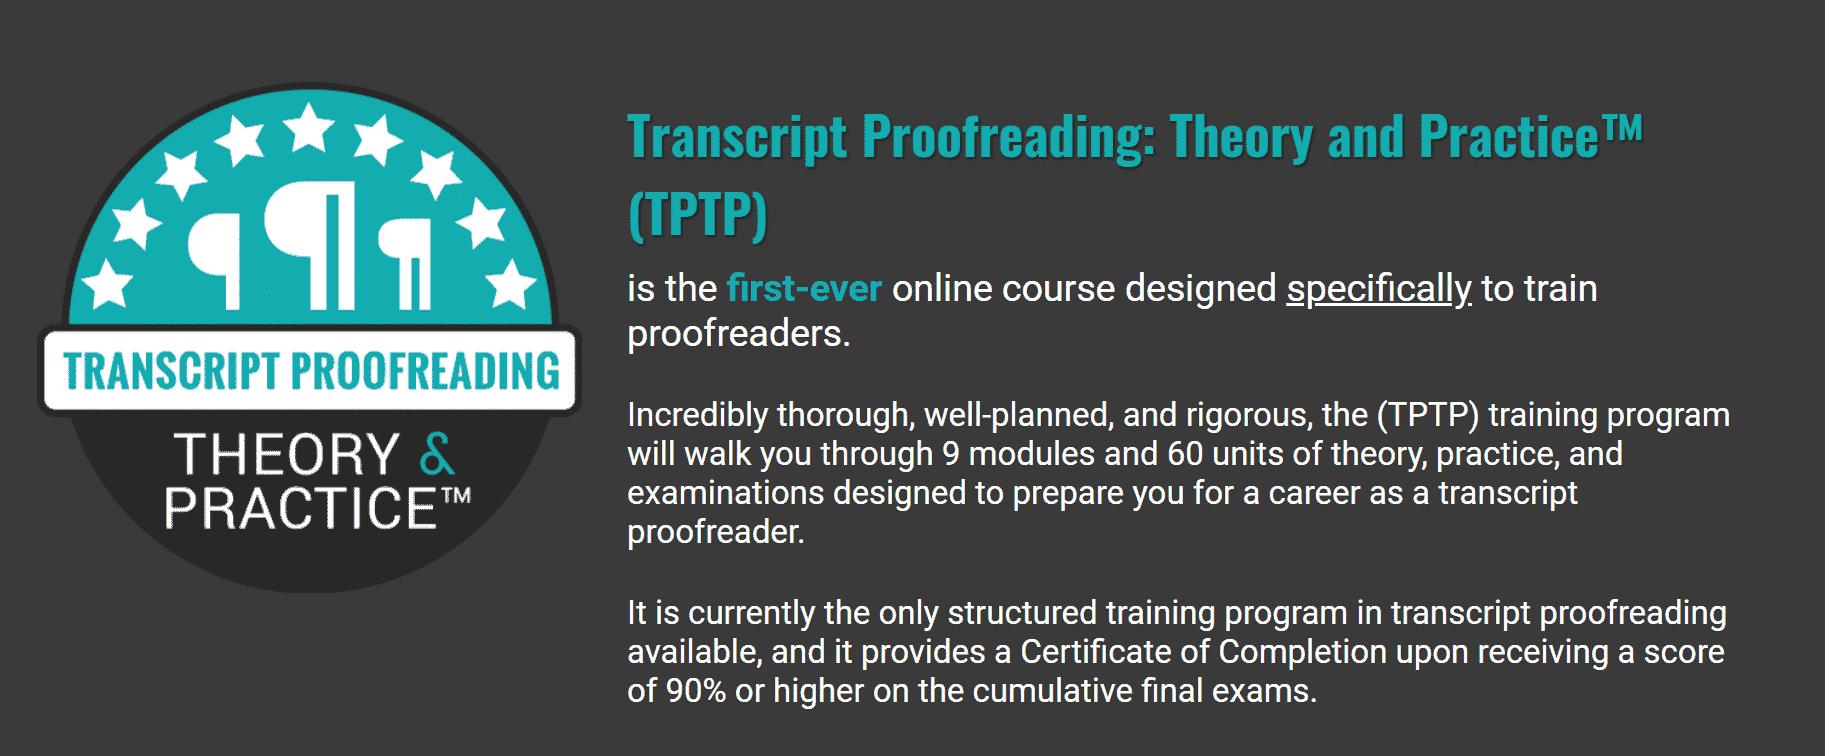 Transcript Proofreading